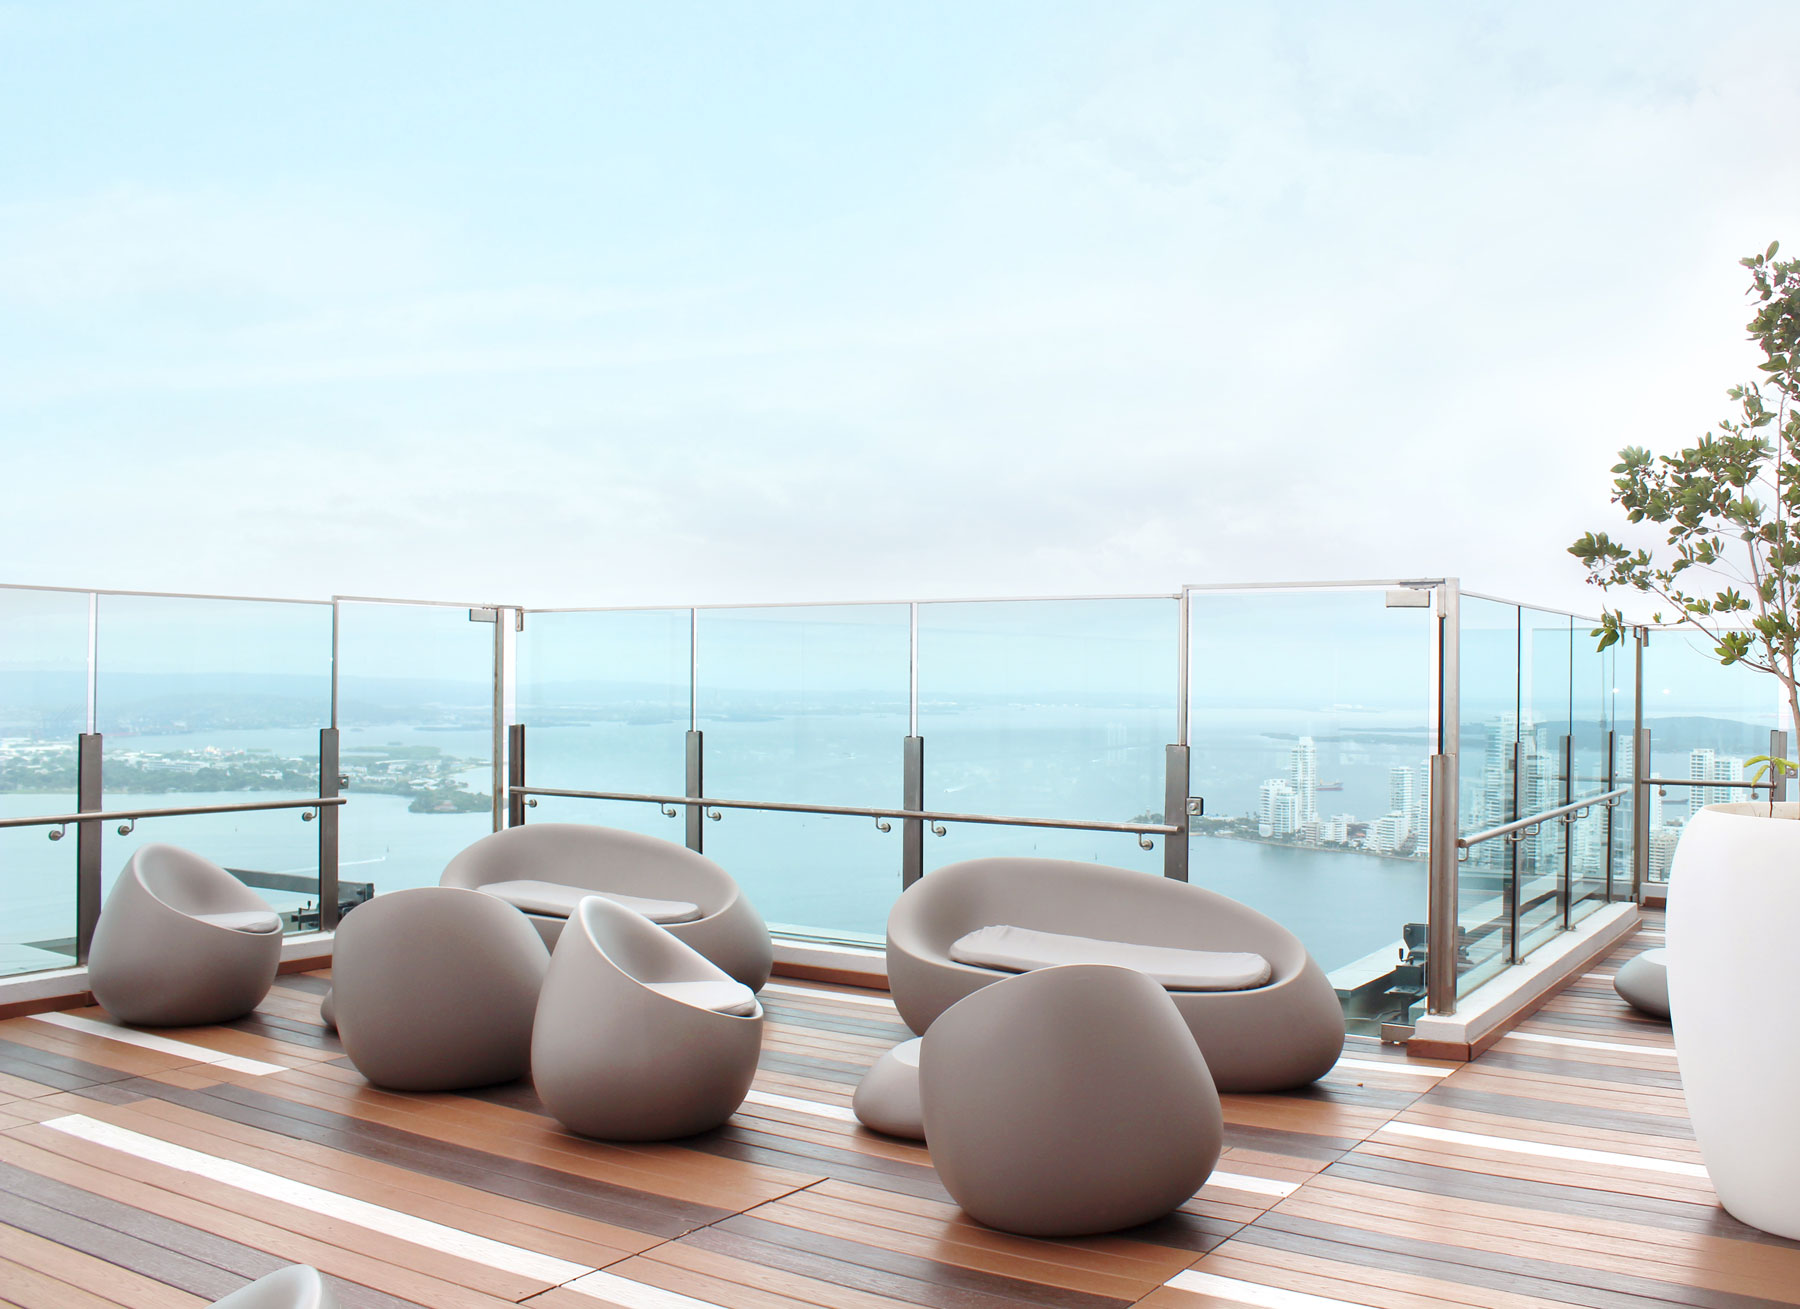 outdoor design furniture sofas sunbed stones frame hotel estelar cartagena colombia vondom 1